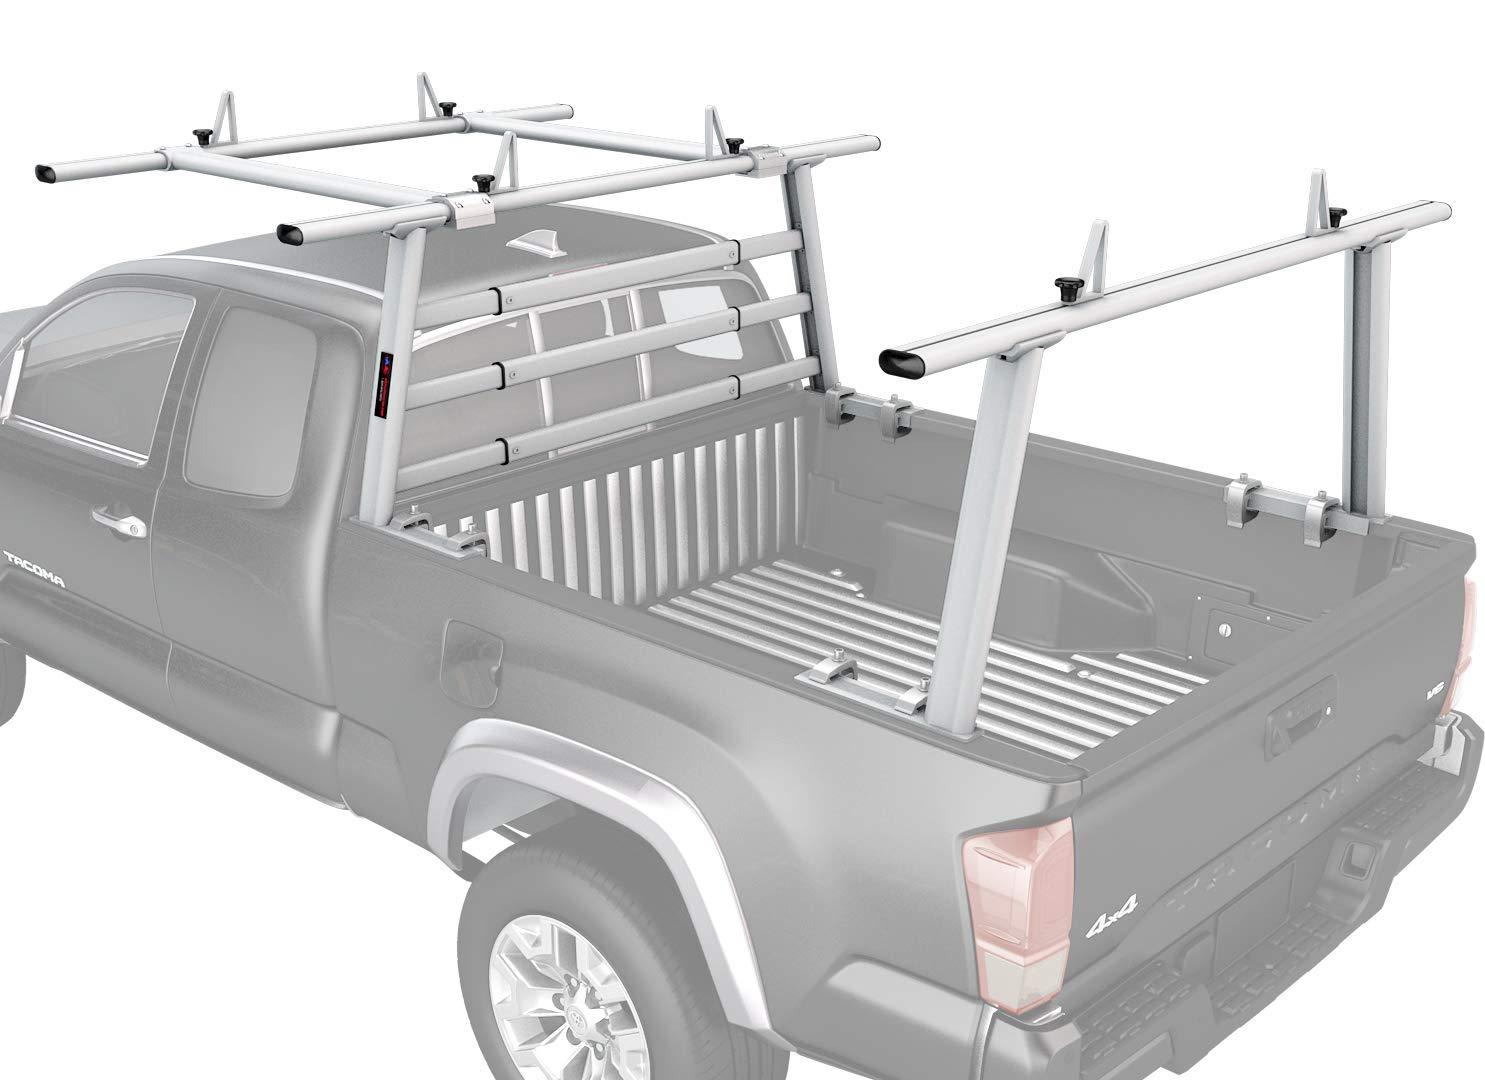 AA-Racks APX25-WG-E Aluminum Headache Rack Pickup Truck Rack w/Cantilever Extension Back Rack - Sandy White